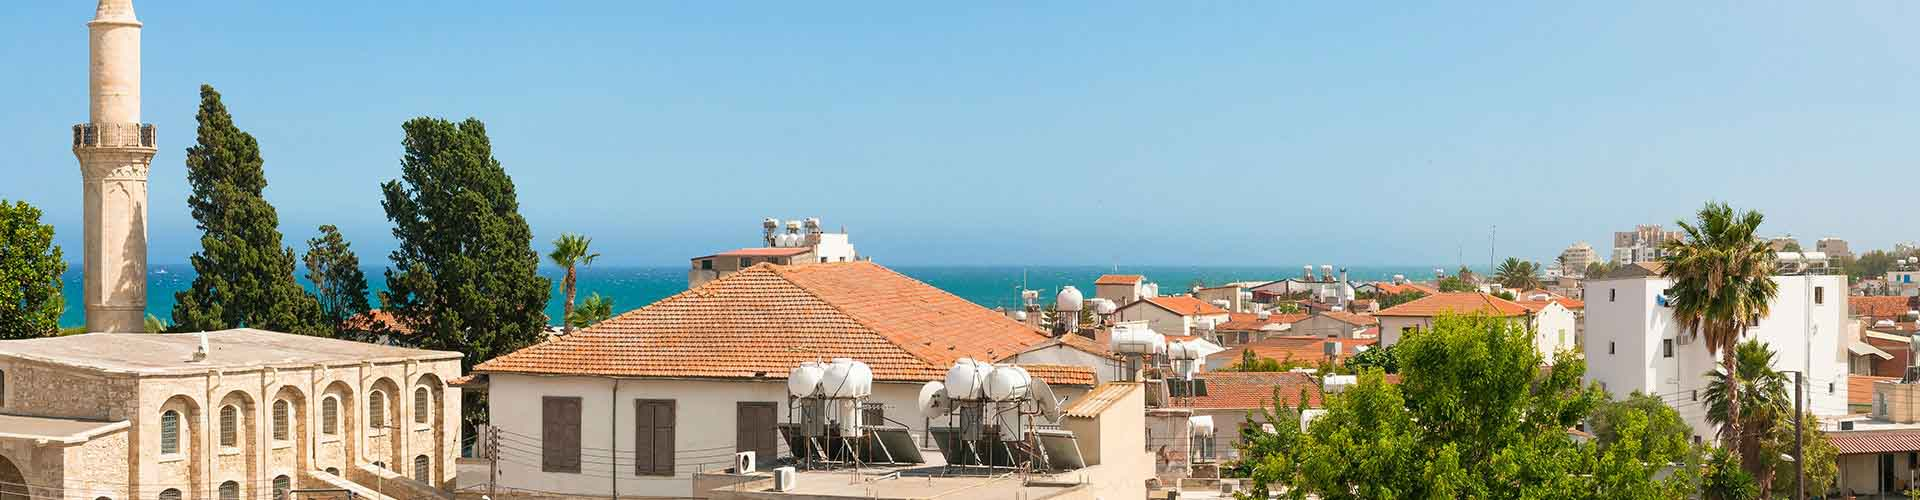 Larnaca – Hostels em Larnaca. Mapas para Larnaca, Fotos e Avaliações para cada Hostels em Larnaca.